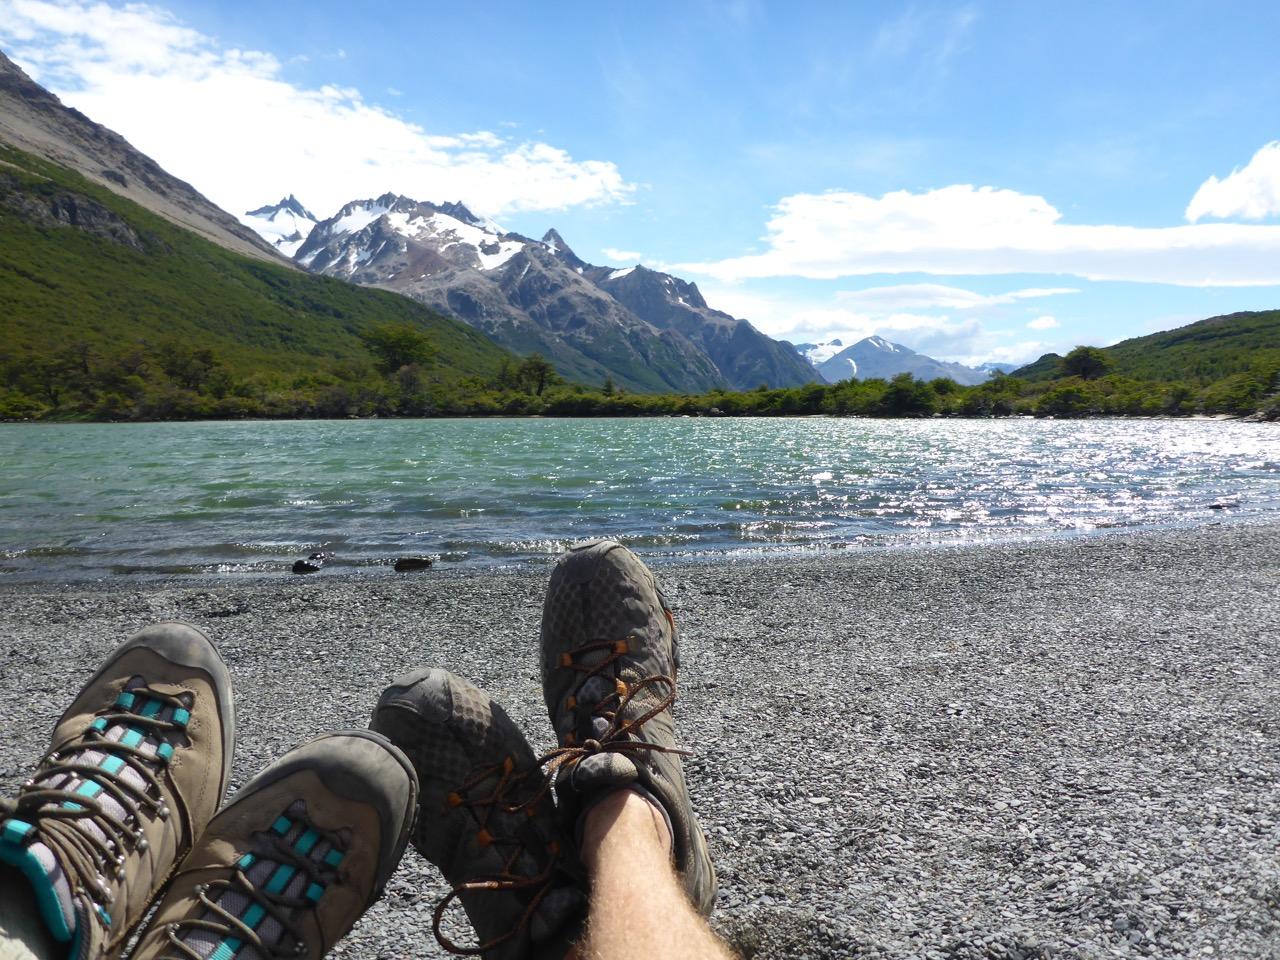 Lago Hija, El Chalten, Patagonia, Argentina